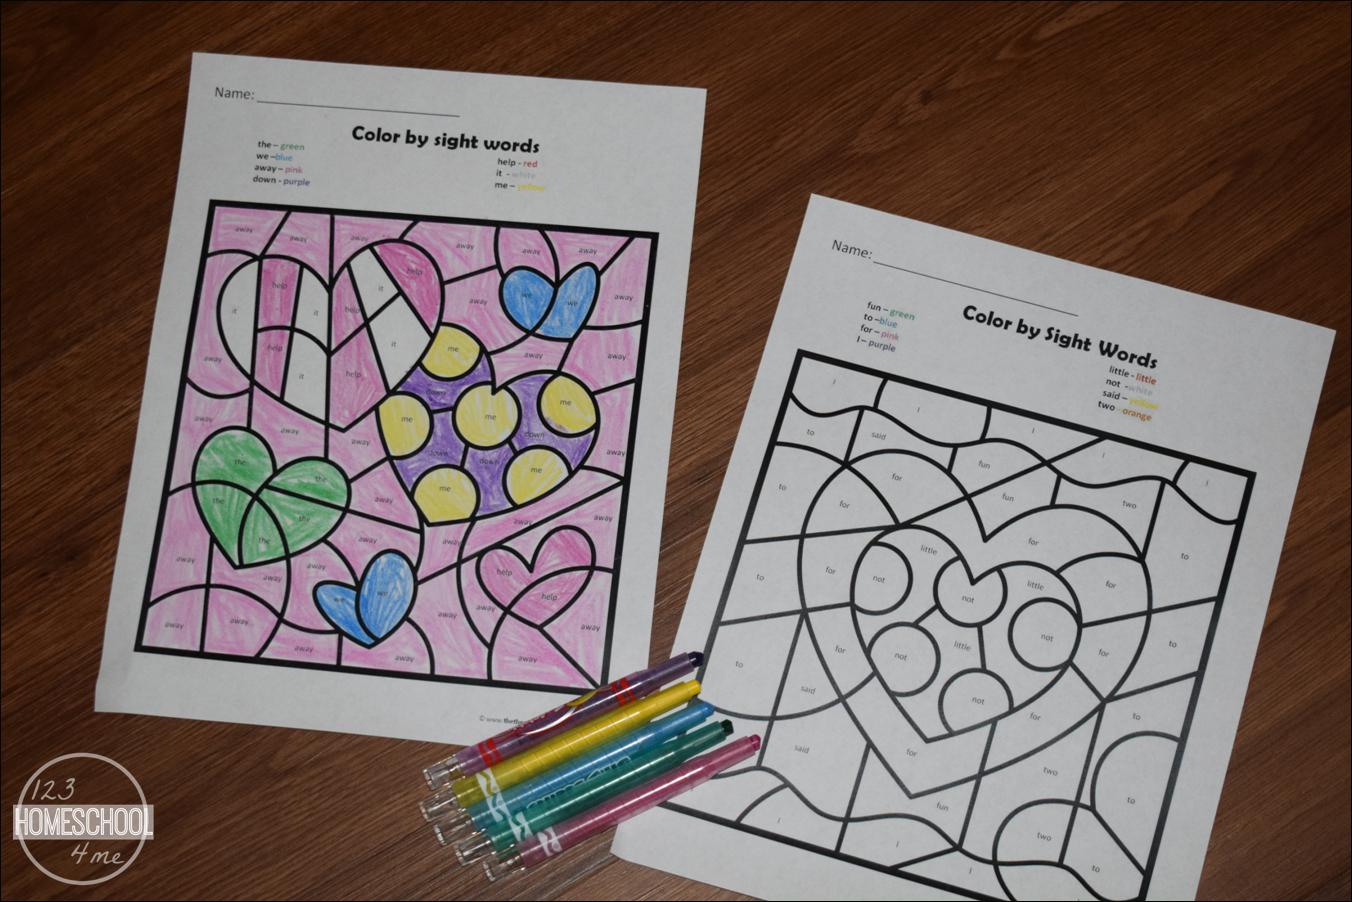 Free Valentines Day Colorsight Words   123 Homeschool 4 Me - Free Printable Valentine Activities For Kindergarten